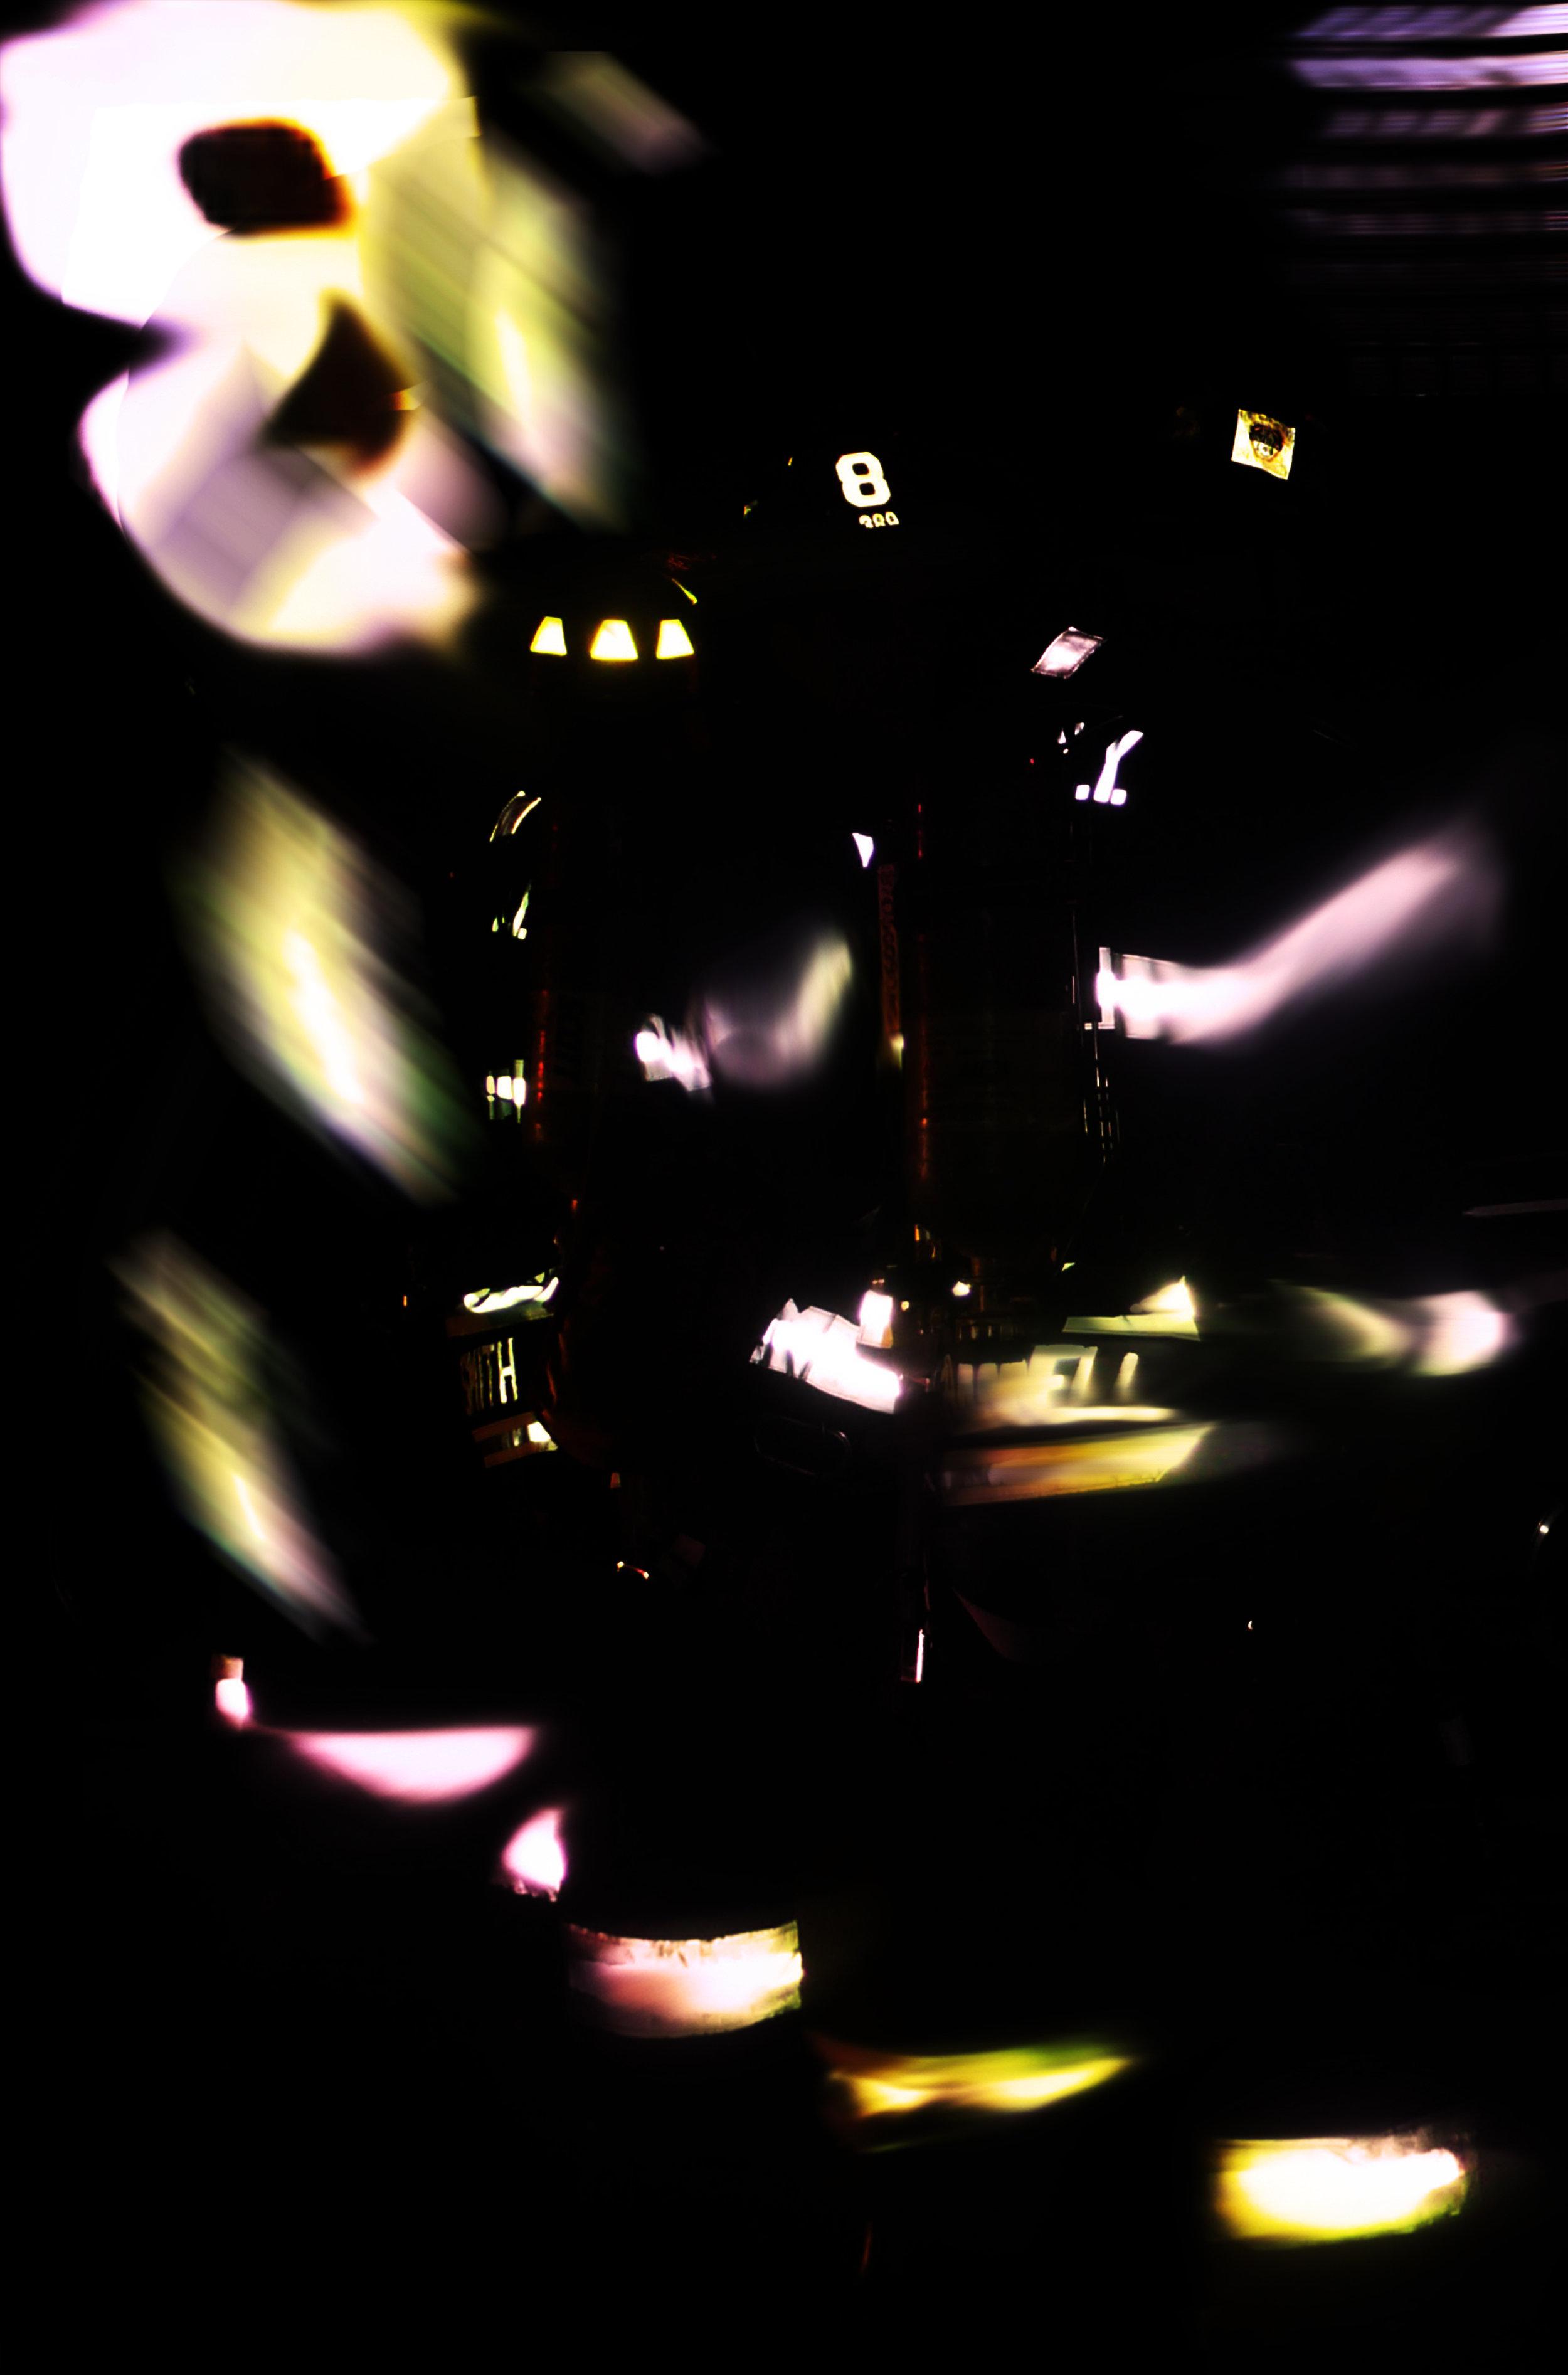 'Glow 4' 2009 © Andrea Blanch